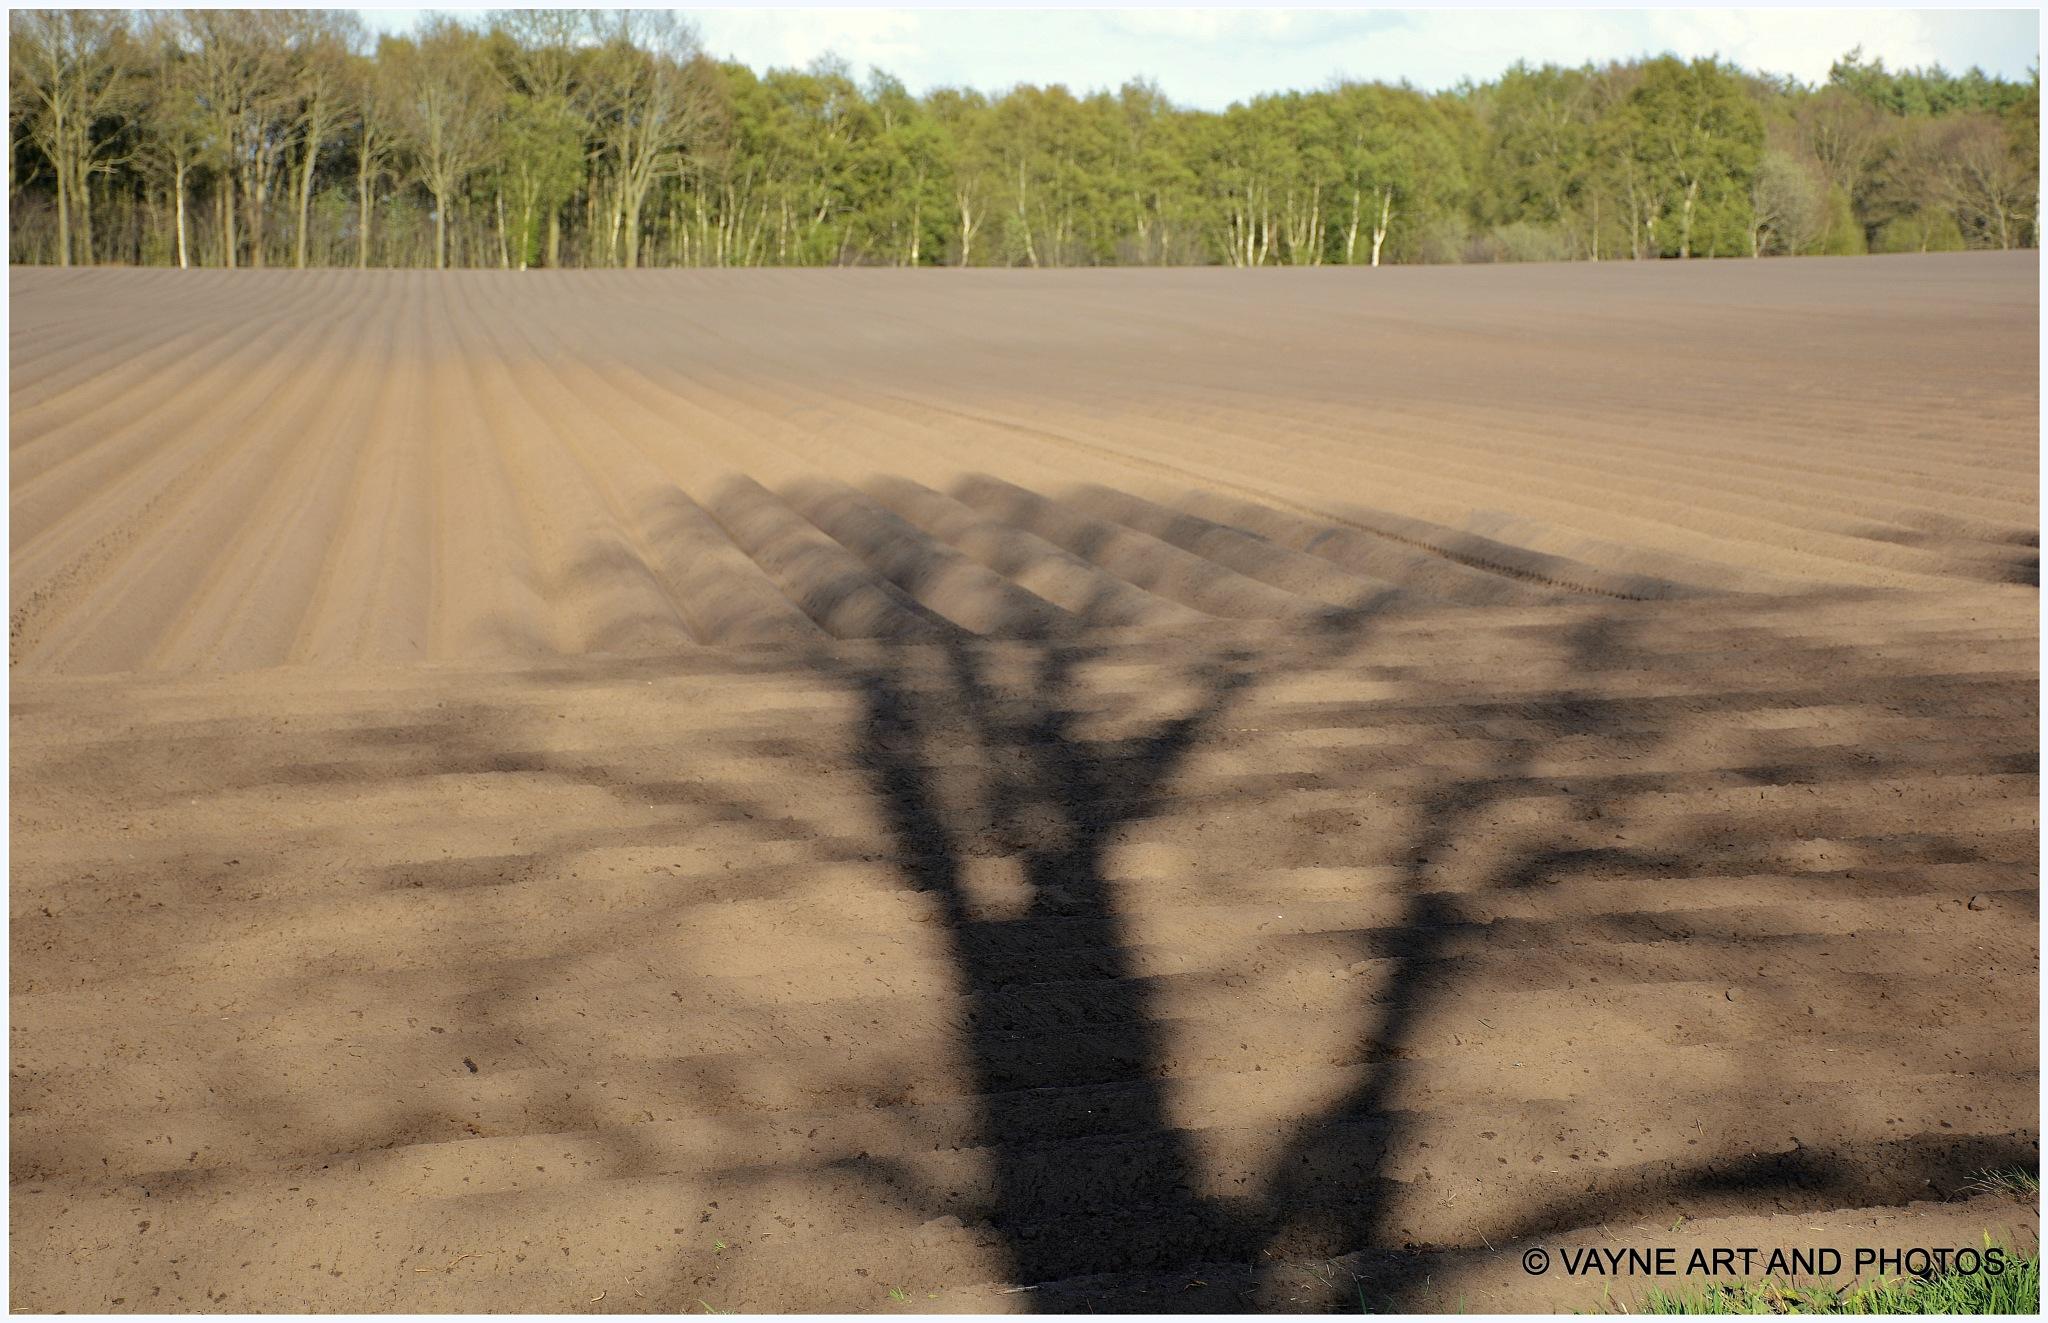 Old Oak shadow on a fresh acker by Jacob van der Veen